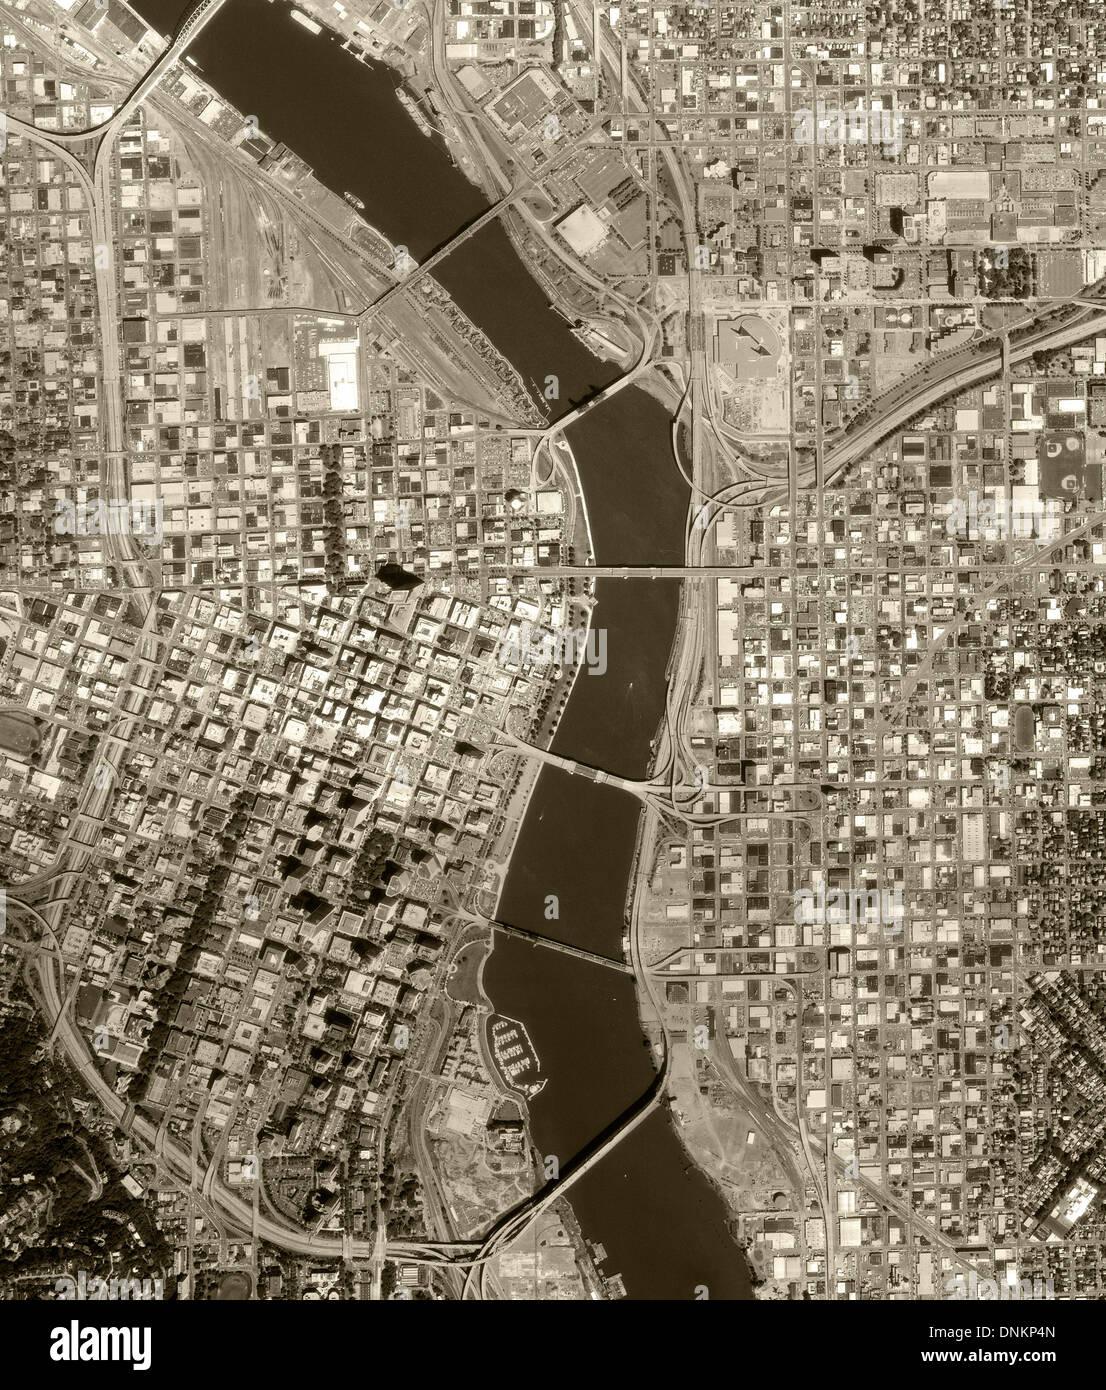 aerial photo map of Portland, Oregon, 1990 - Stock Image